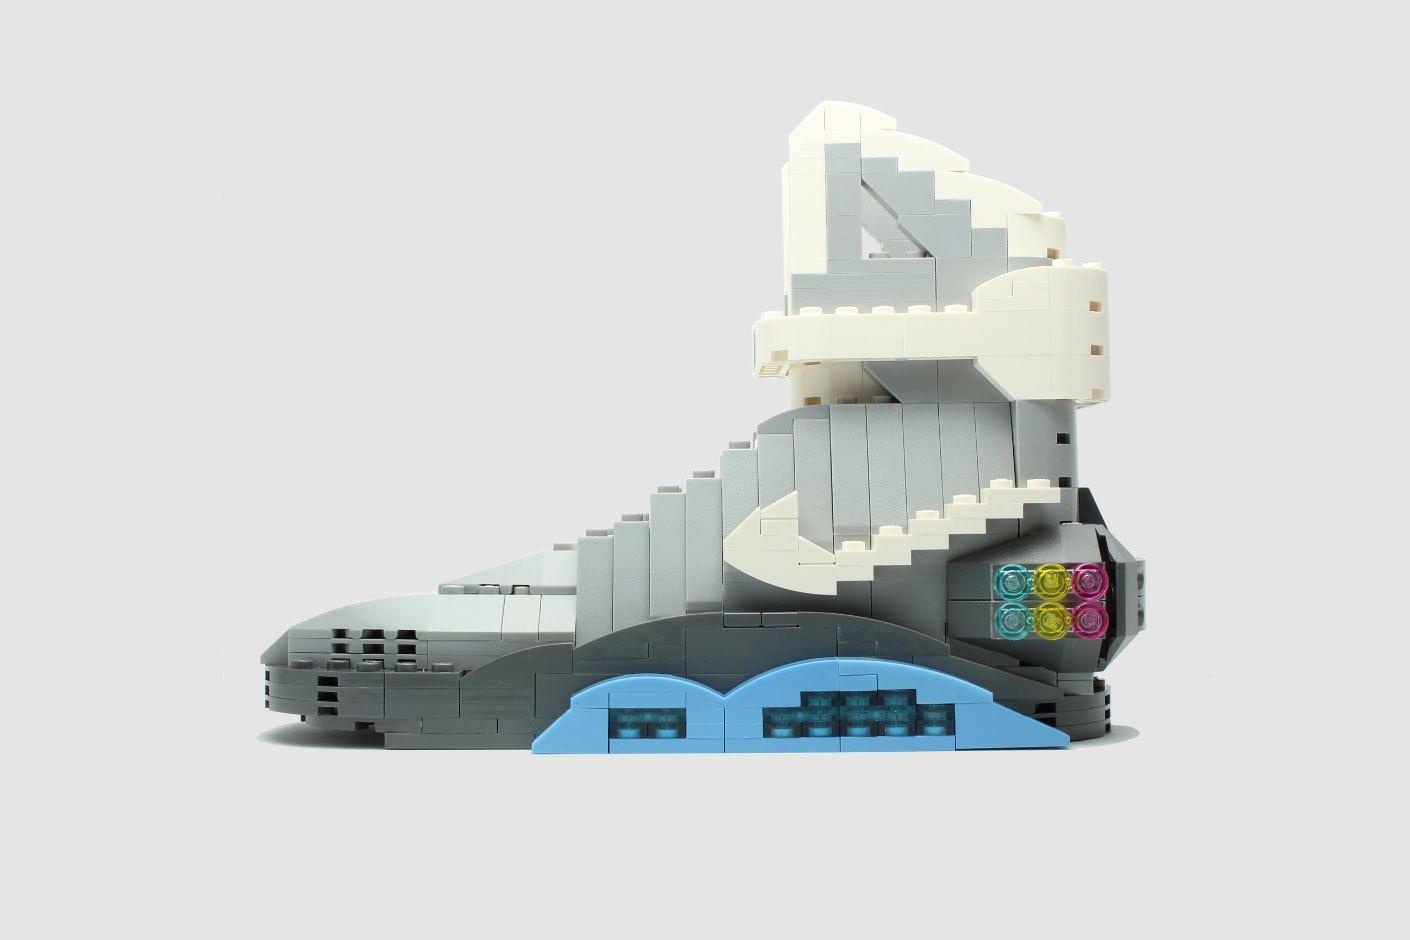 tom-yoo-lego-sneakers-222